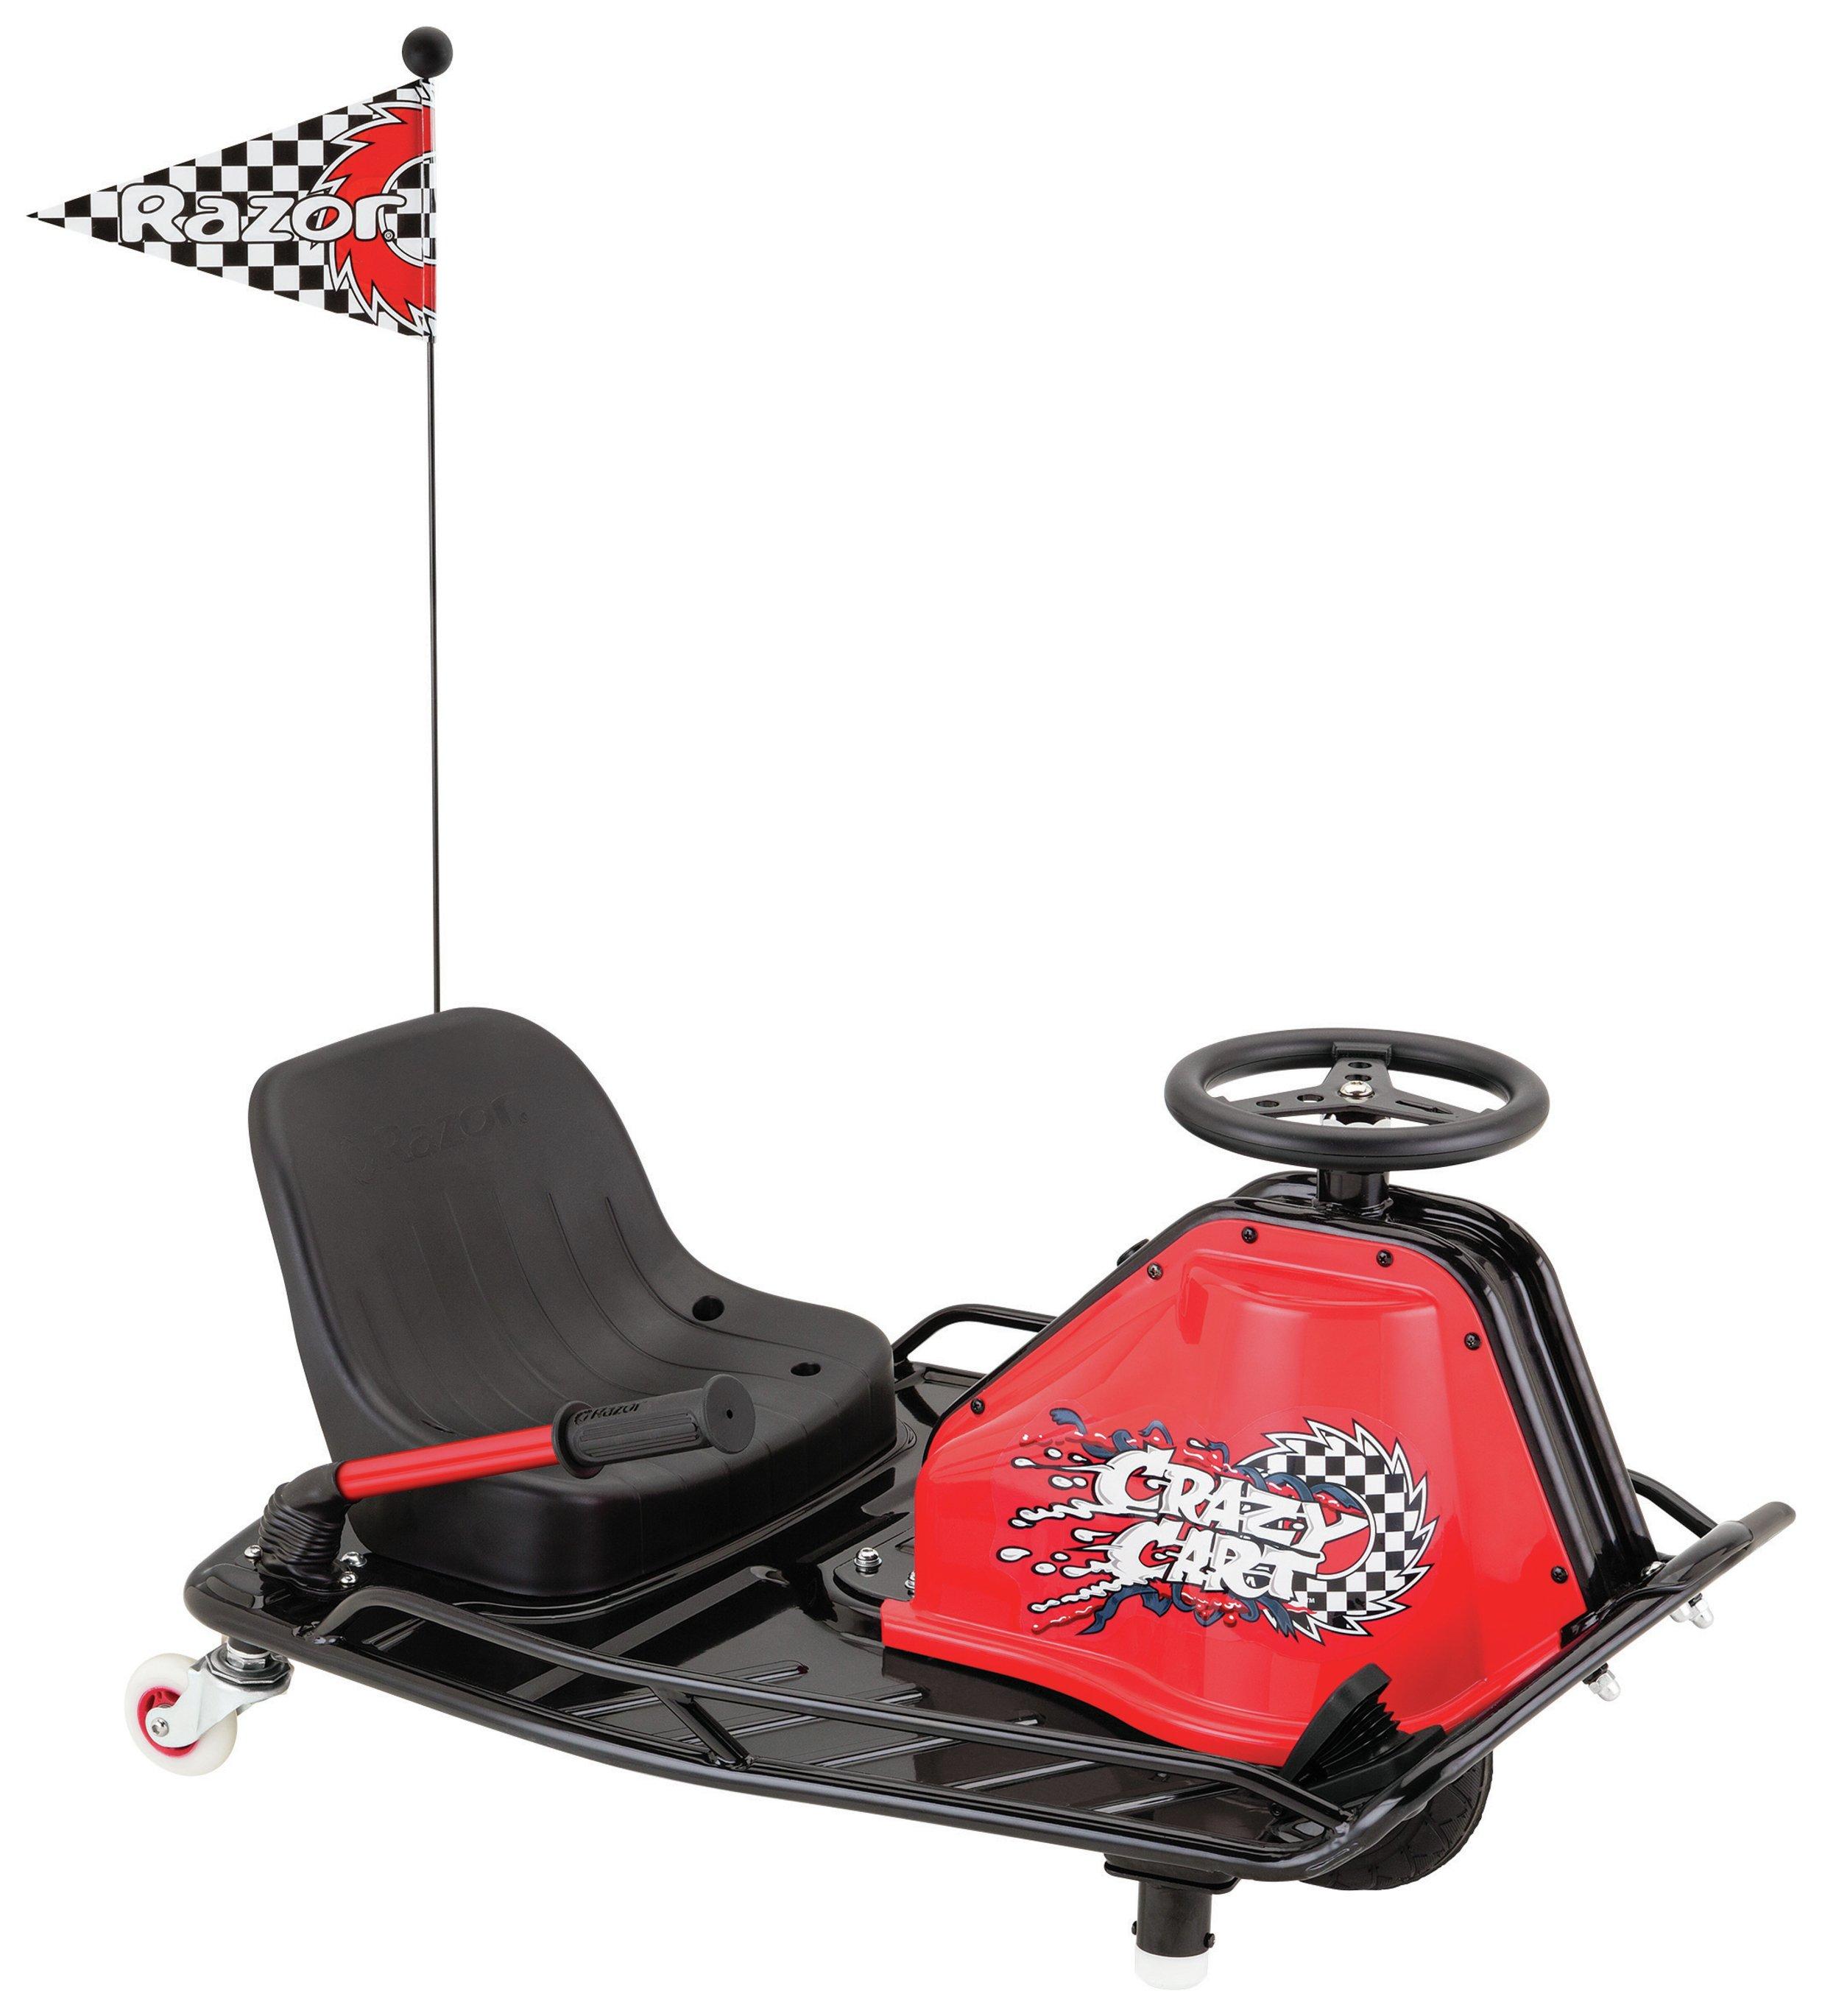 Razor - Crazy Cart